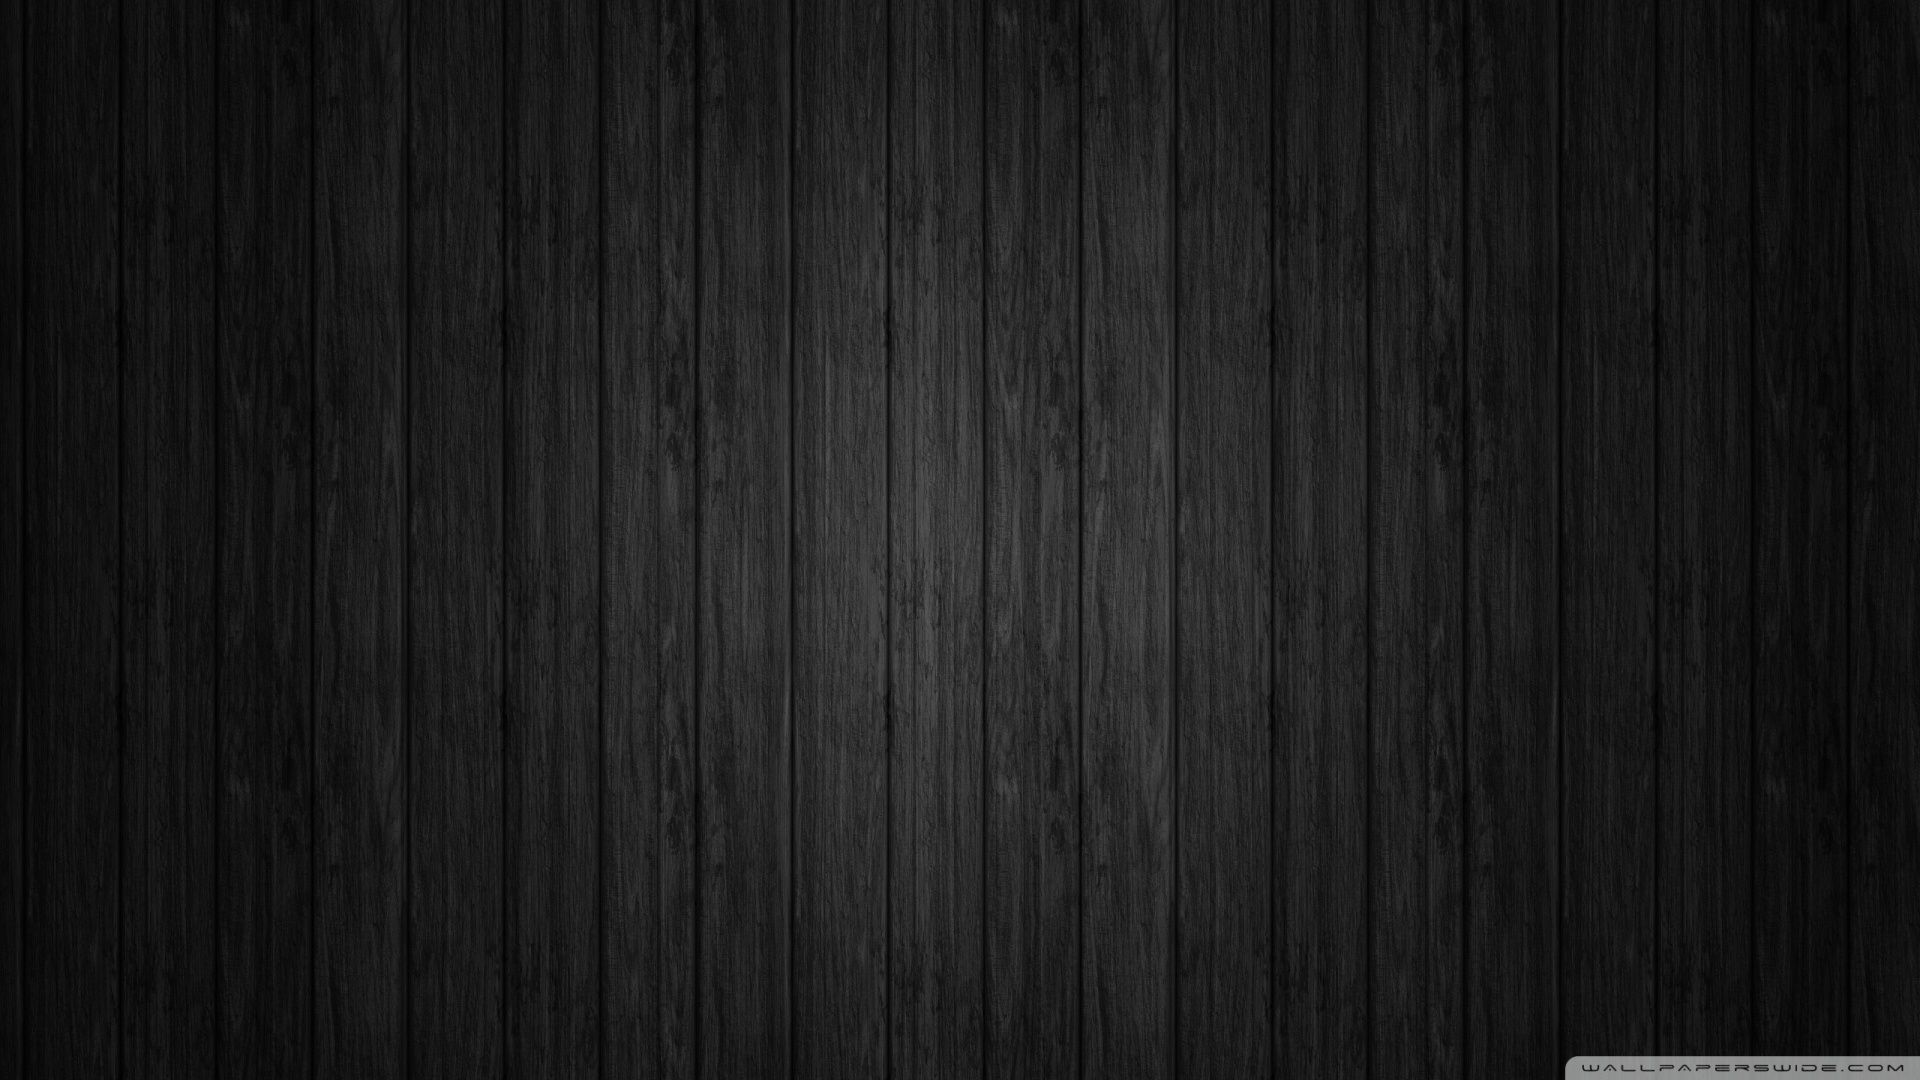 Black Wallpapers 1080p - Wallpaper Cave